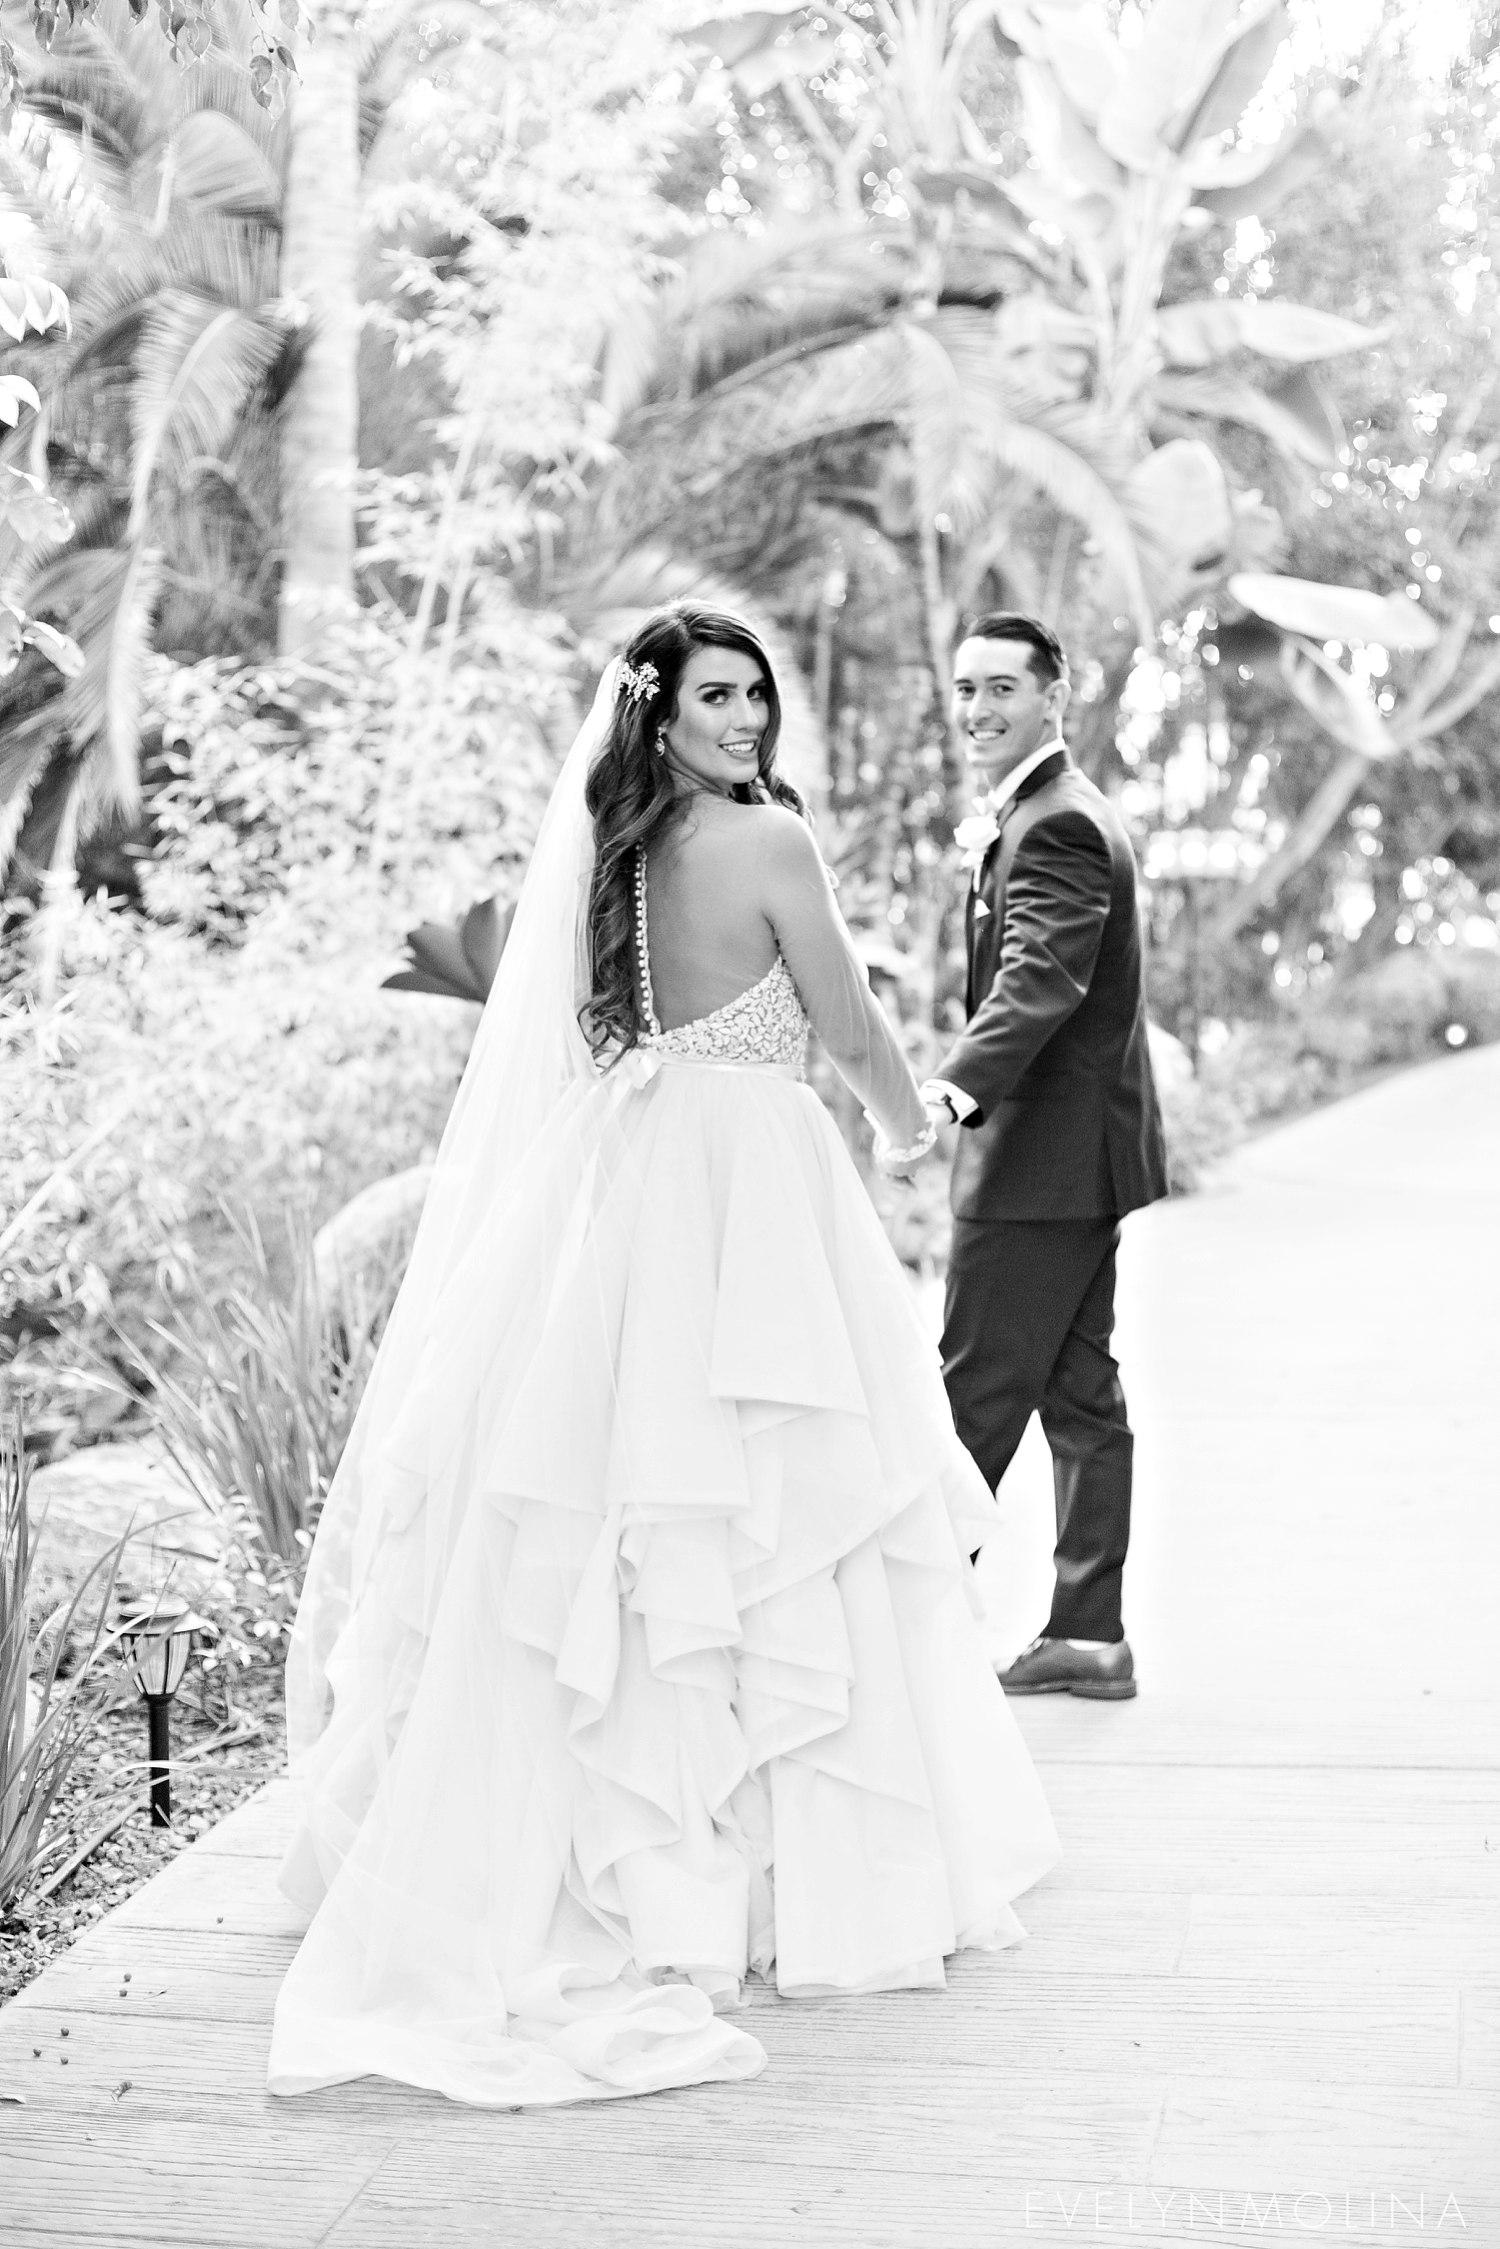 Paradise Falls Summer Wedding - Samantha and Cliff_060.jpg